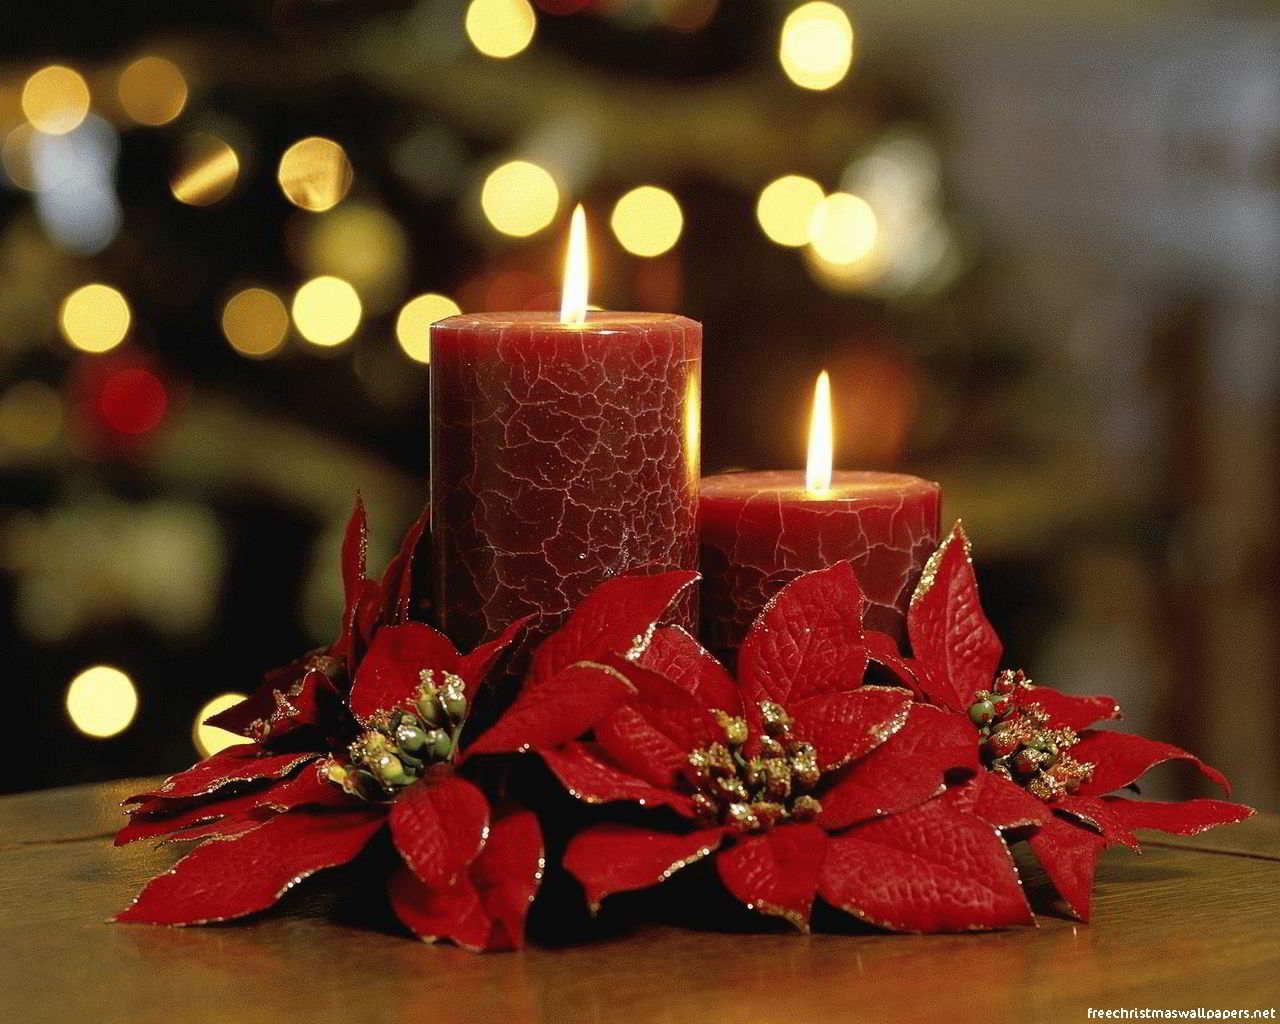 Гадание на картах таро на рождество 6 7 января гадание на таро отзывы